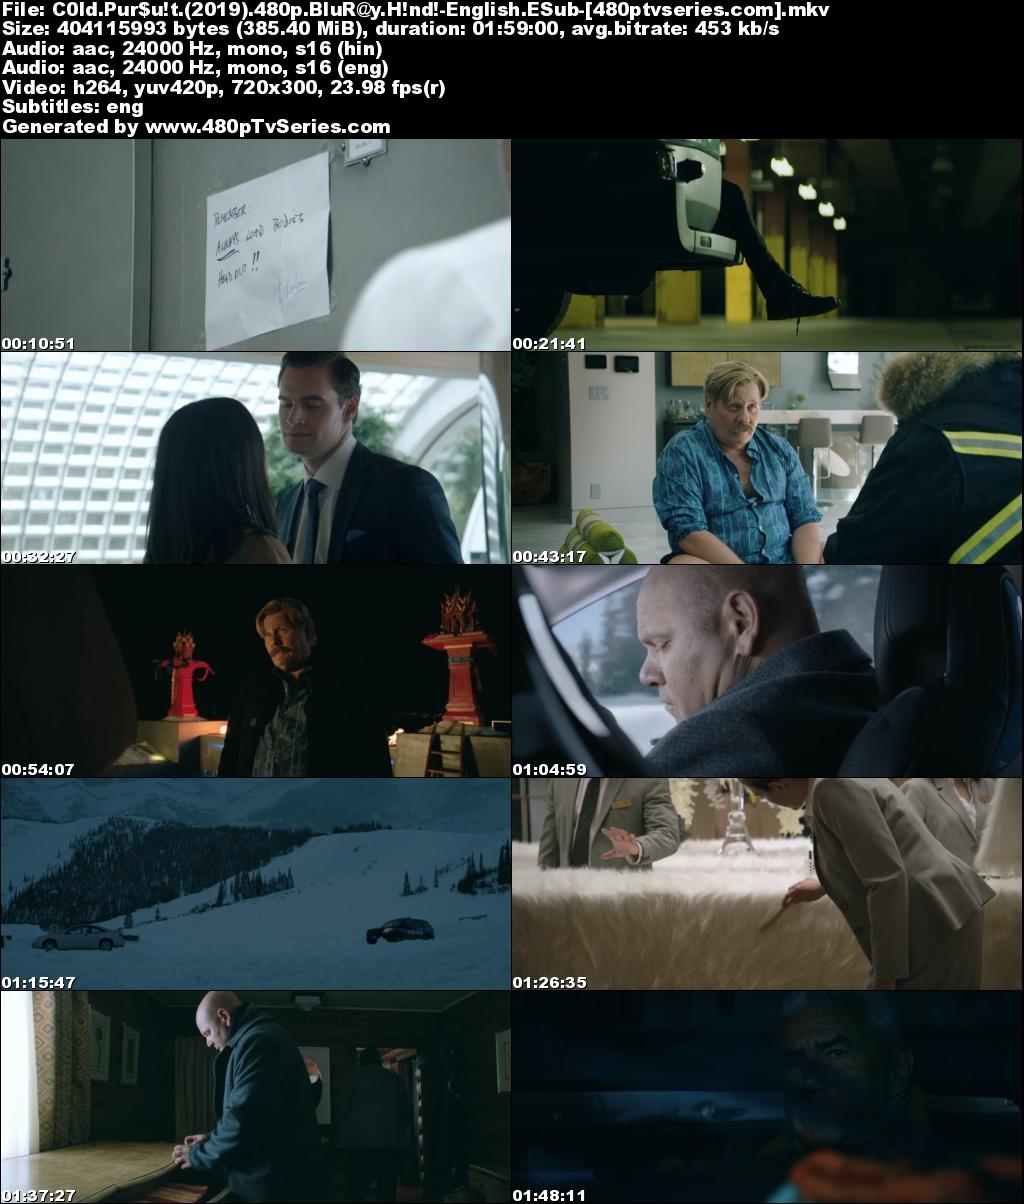 Cold Pursuit (2019) 350MB Full Hindi Dual Audio Movie Download 480p Bluray Free Watch Online Full Movie Download Worldfree4u 9xmovies